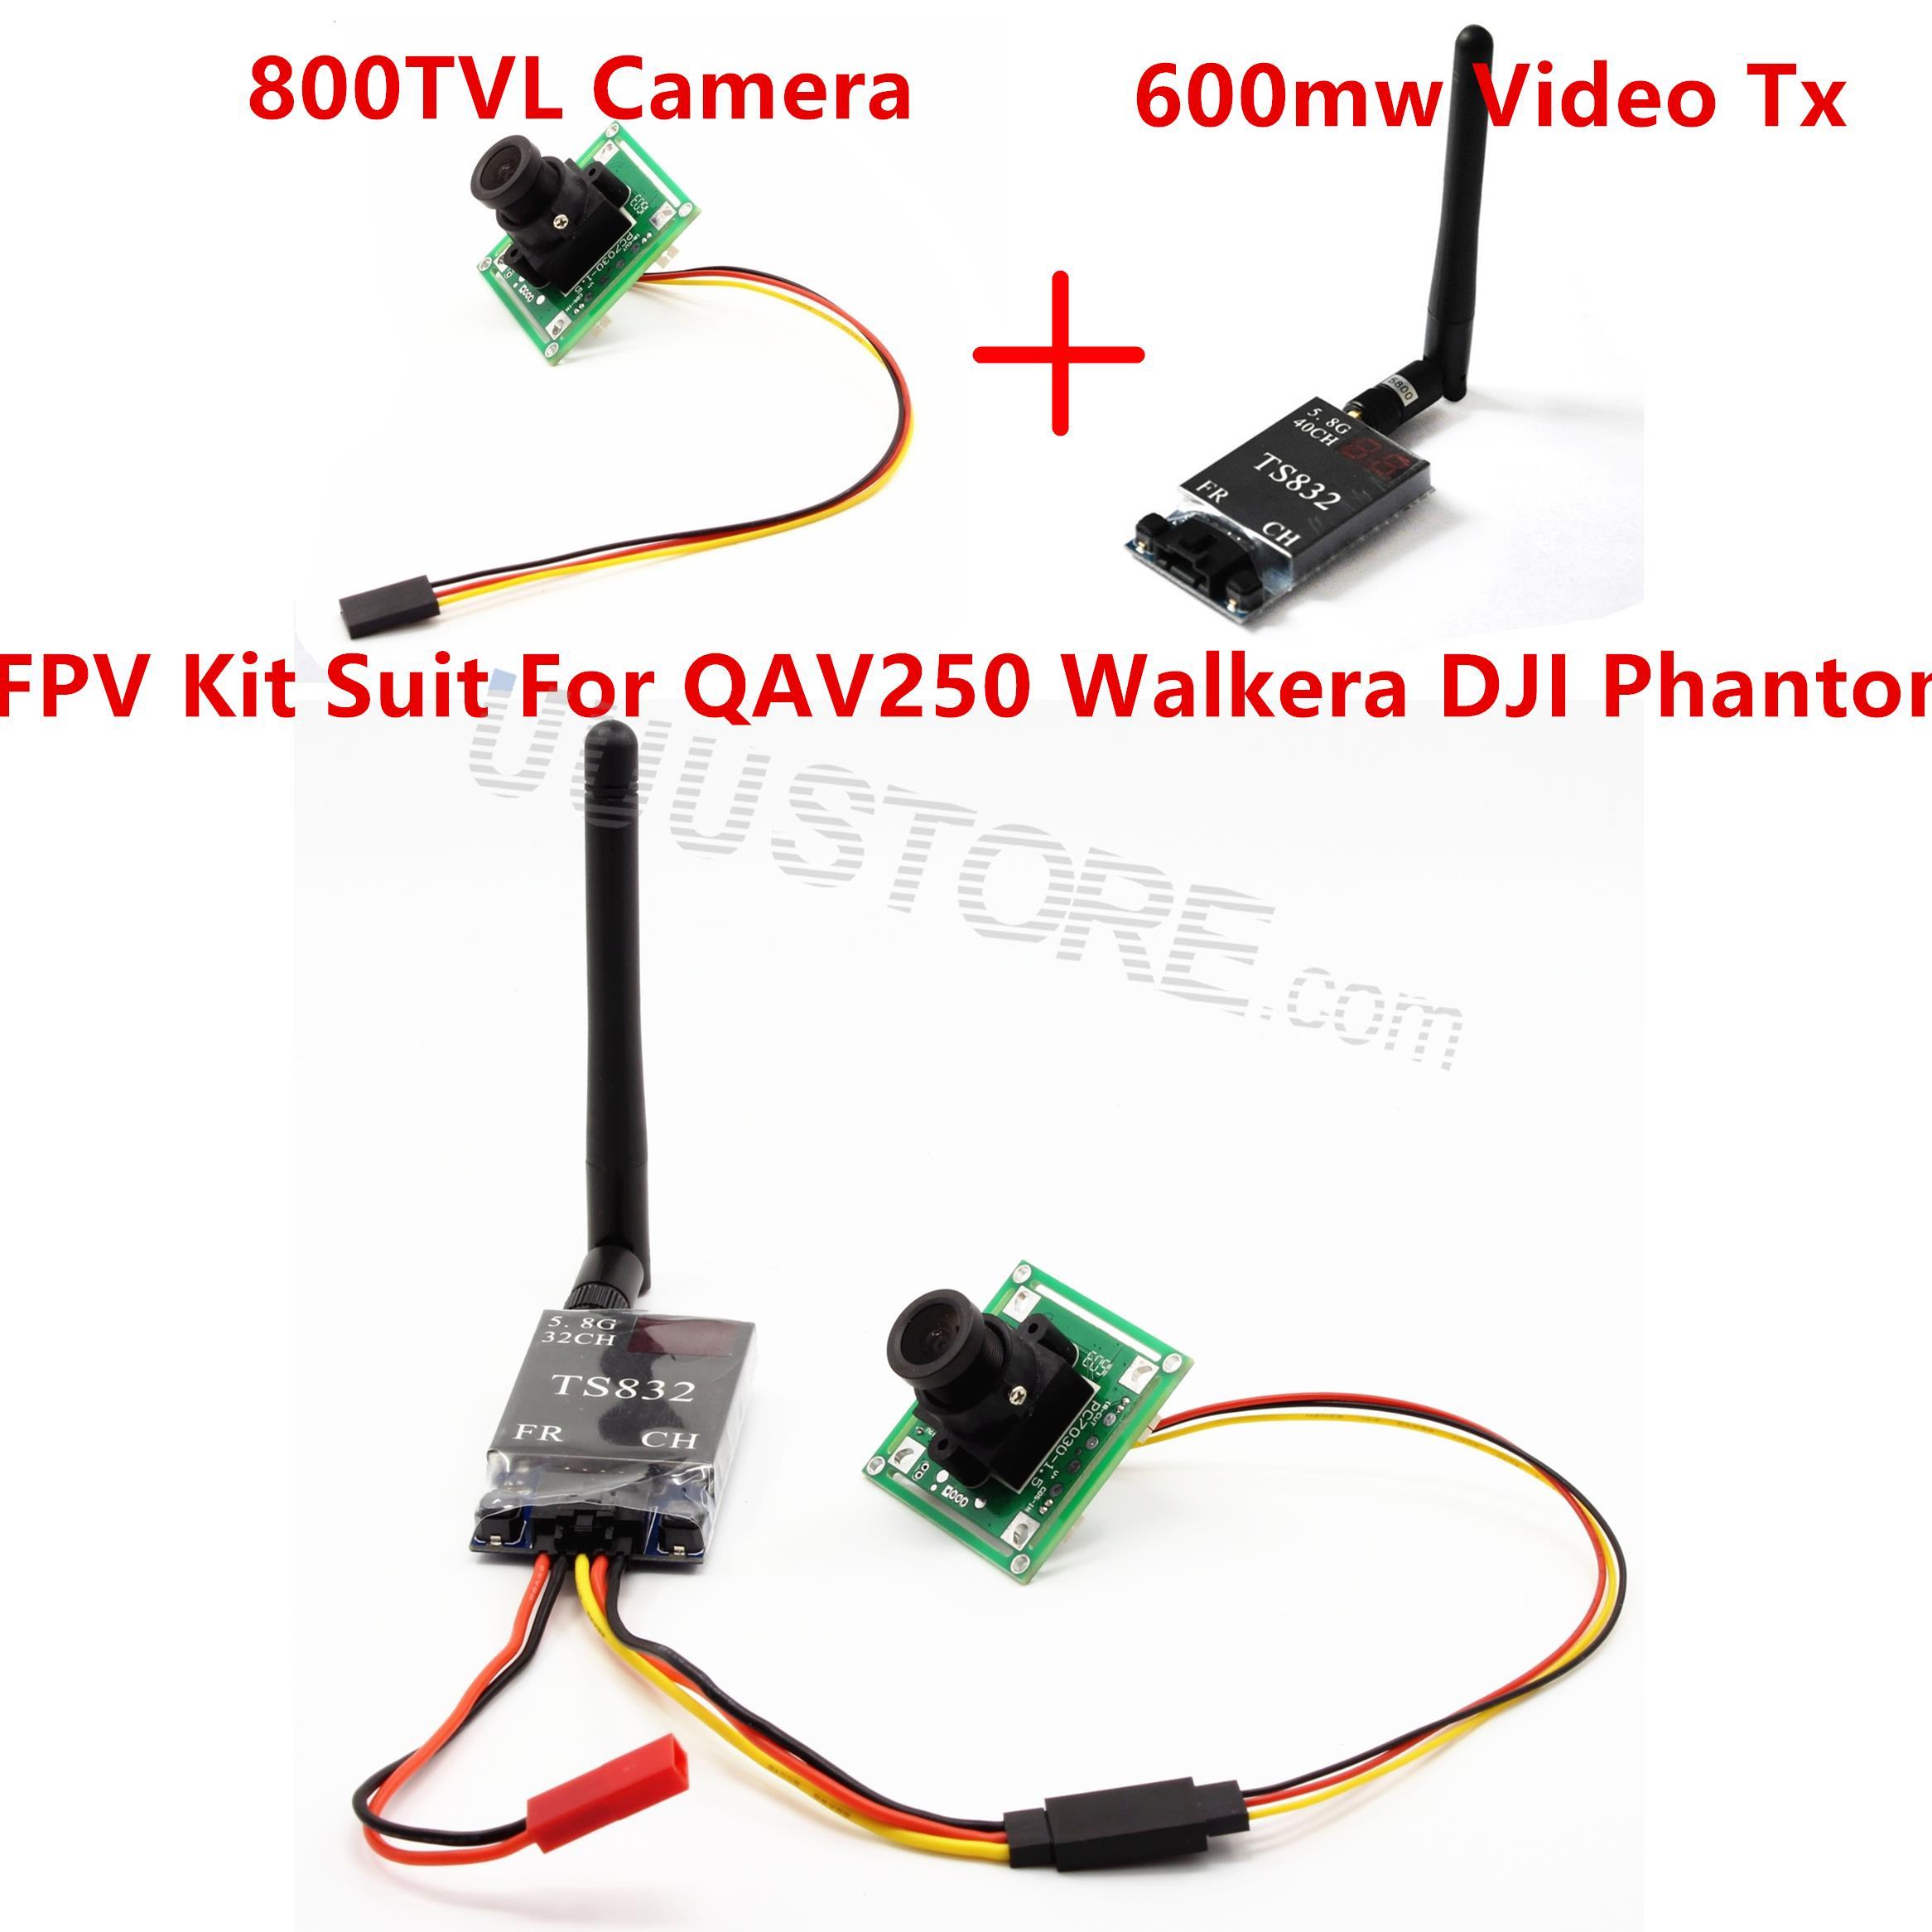 fpv transmitter wiring diagram mitsubishi plc cc3d flight controller naze32 esc